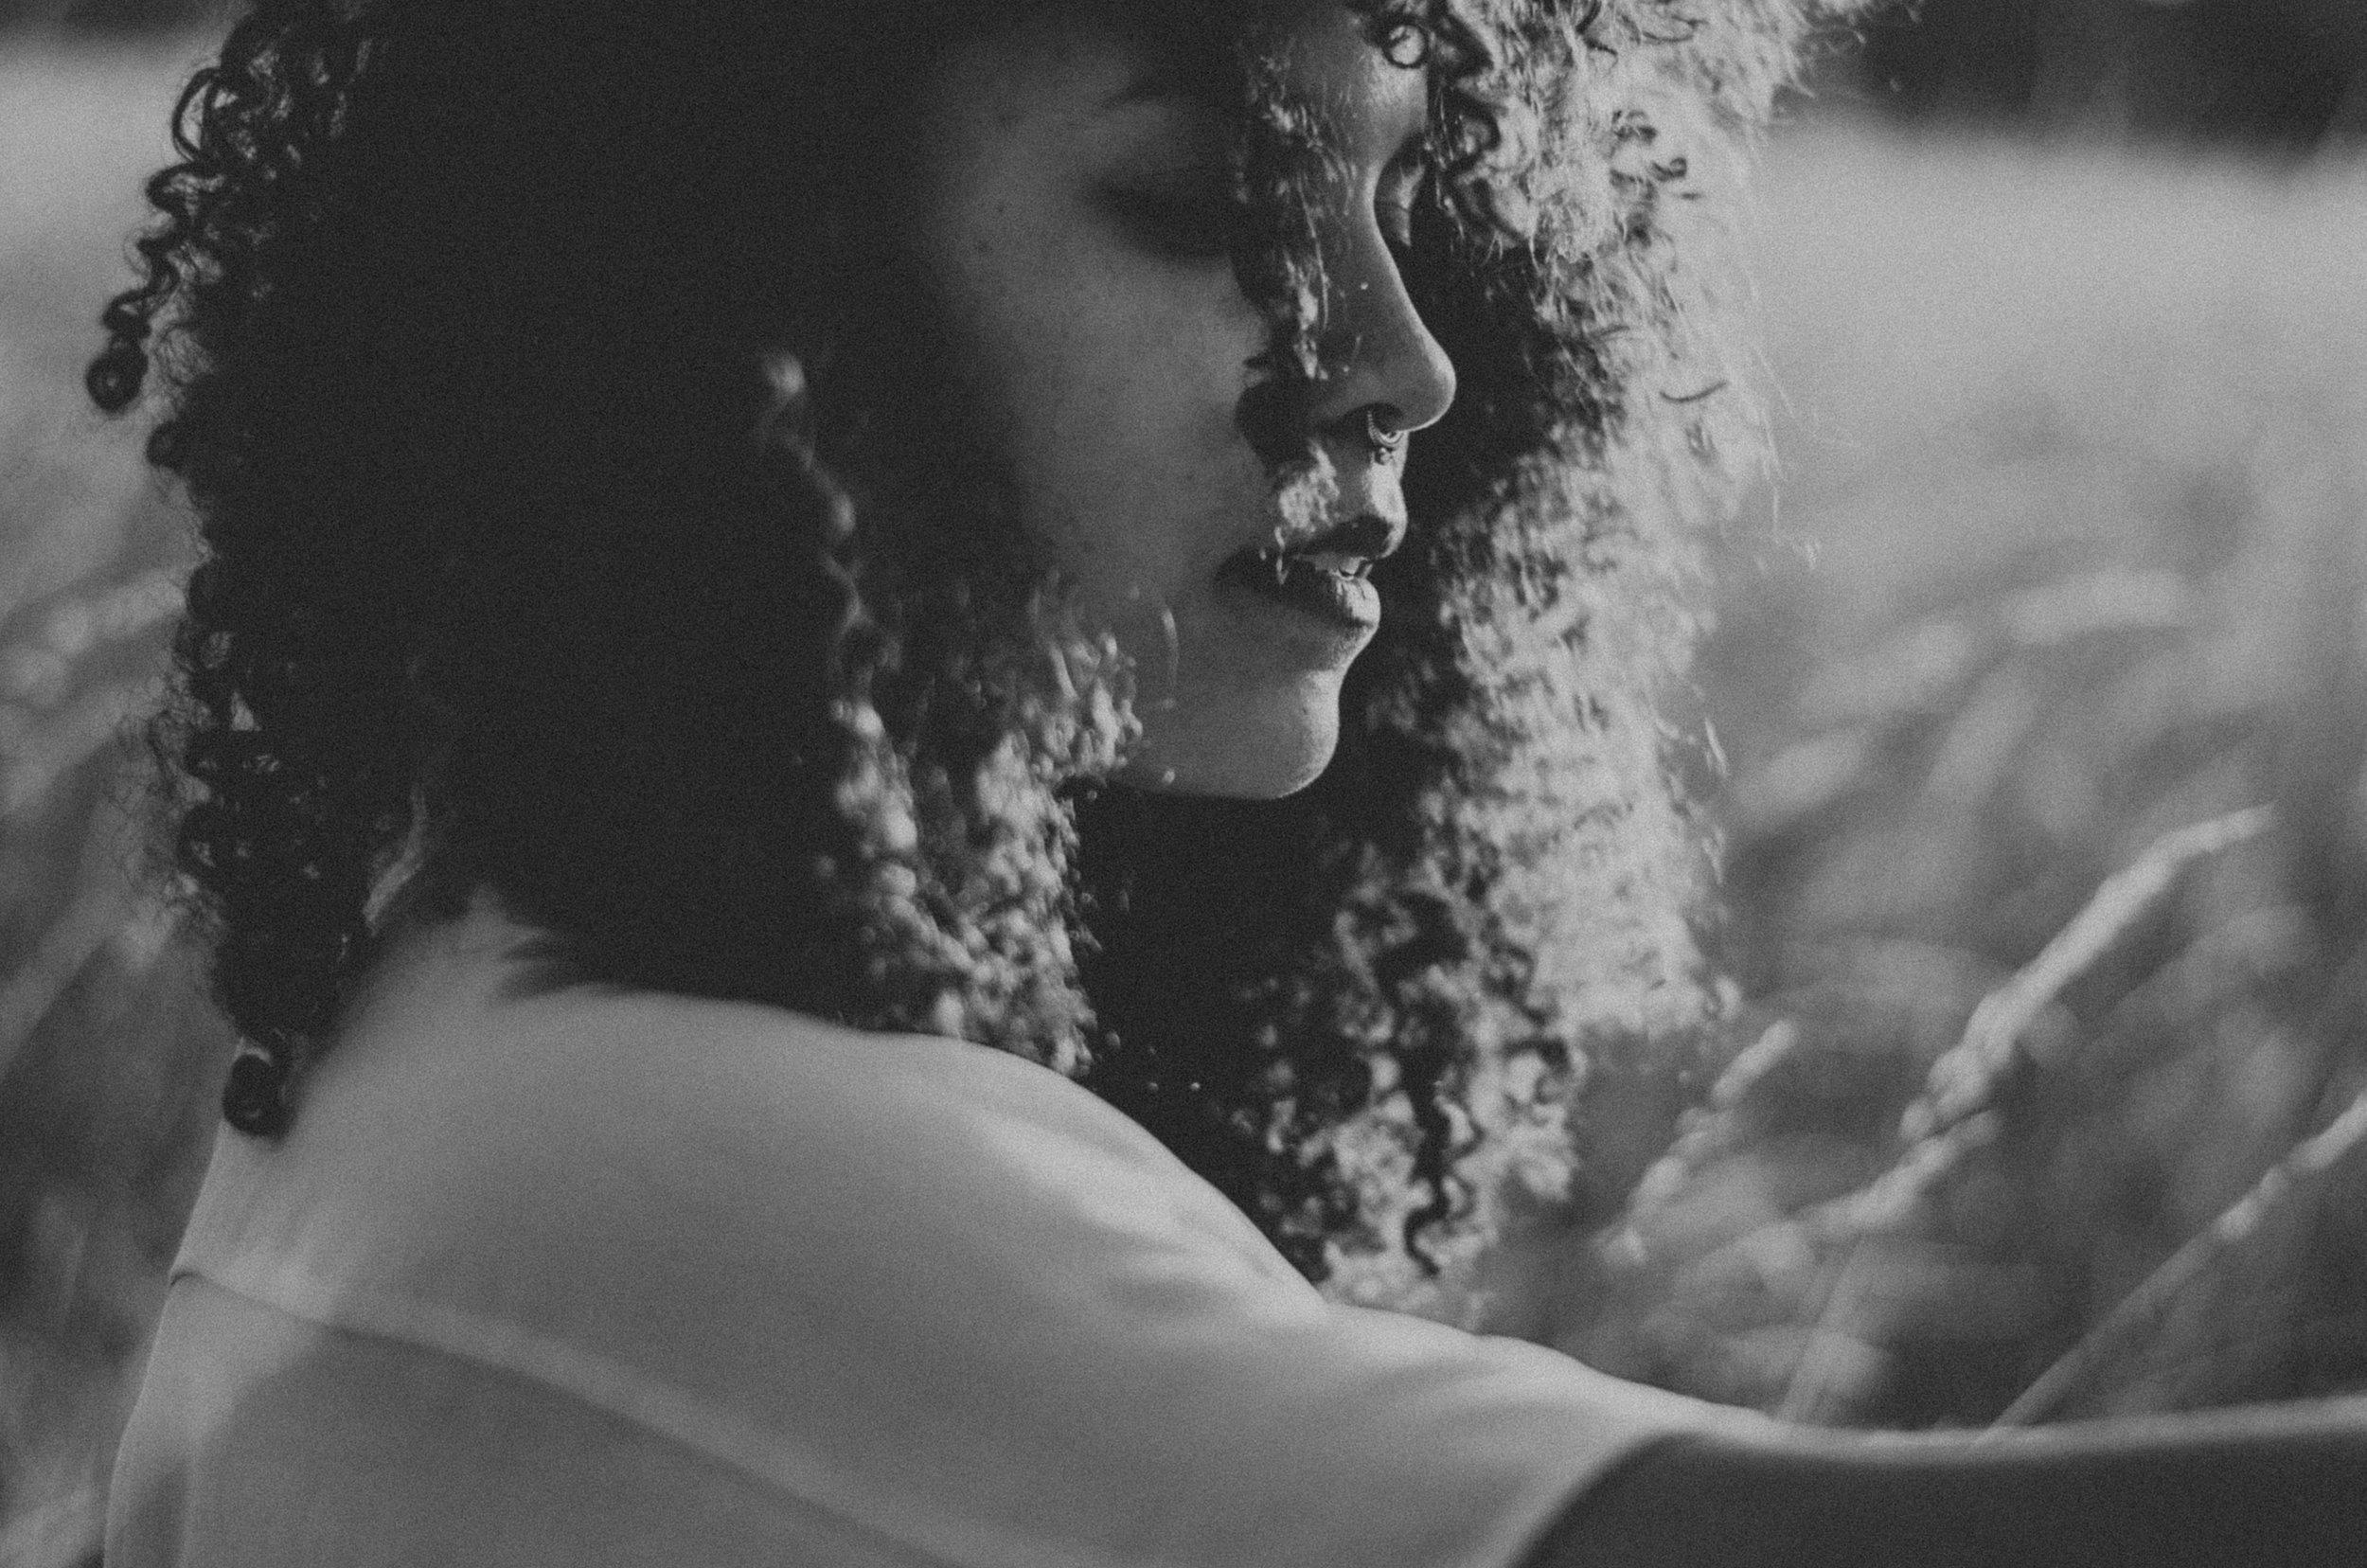 Inka-Portrait-Session-Aiste-Saulyte-Photography-17-07-30-346.jpg